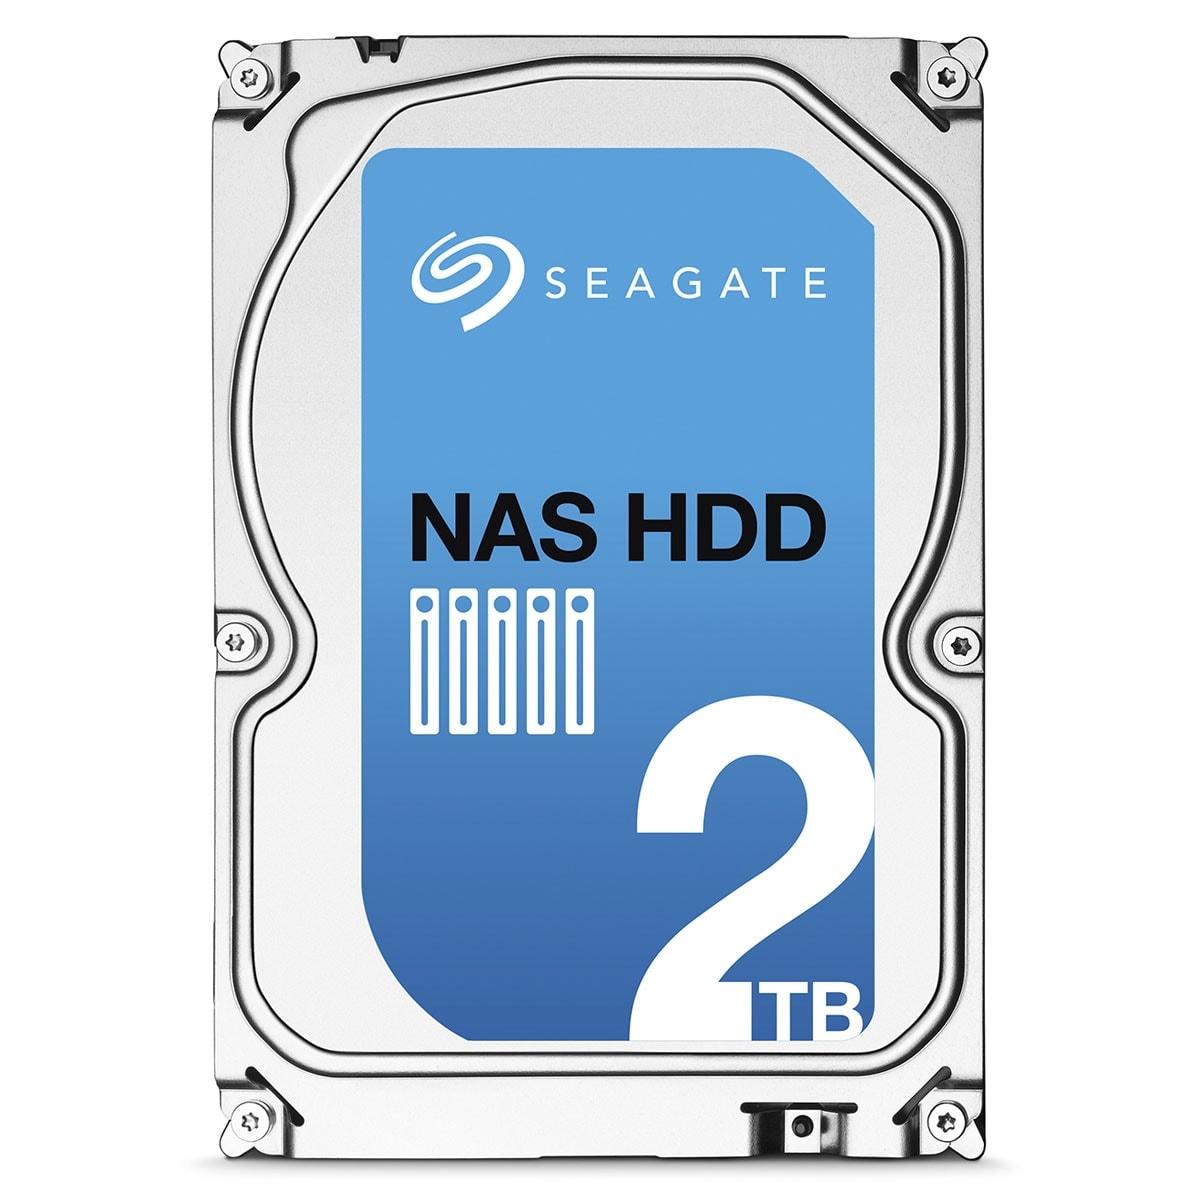 "Seagate 2To SATA III 64Mo NAS HDD ST2000VN000 - Disque dur interne 3.5"" - 0"